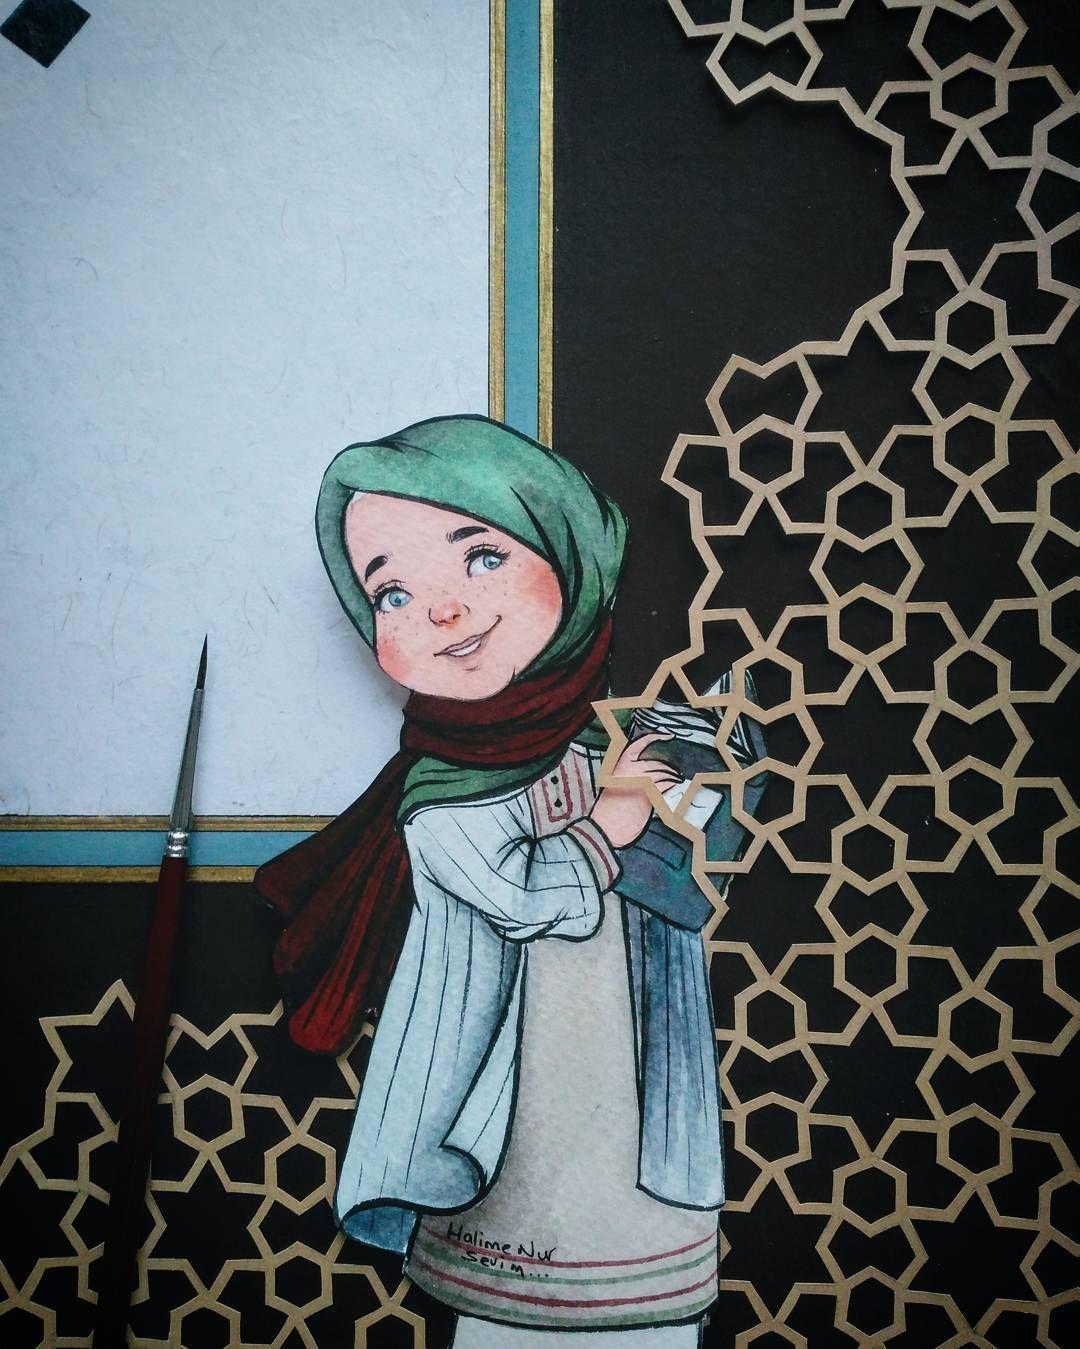 gambar kartun muslimah 6 sahabat | Kartun, Gambar, Seni ...